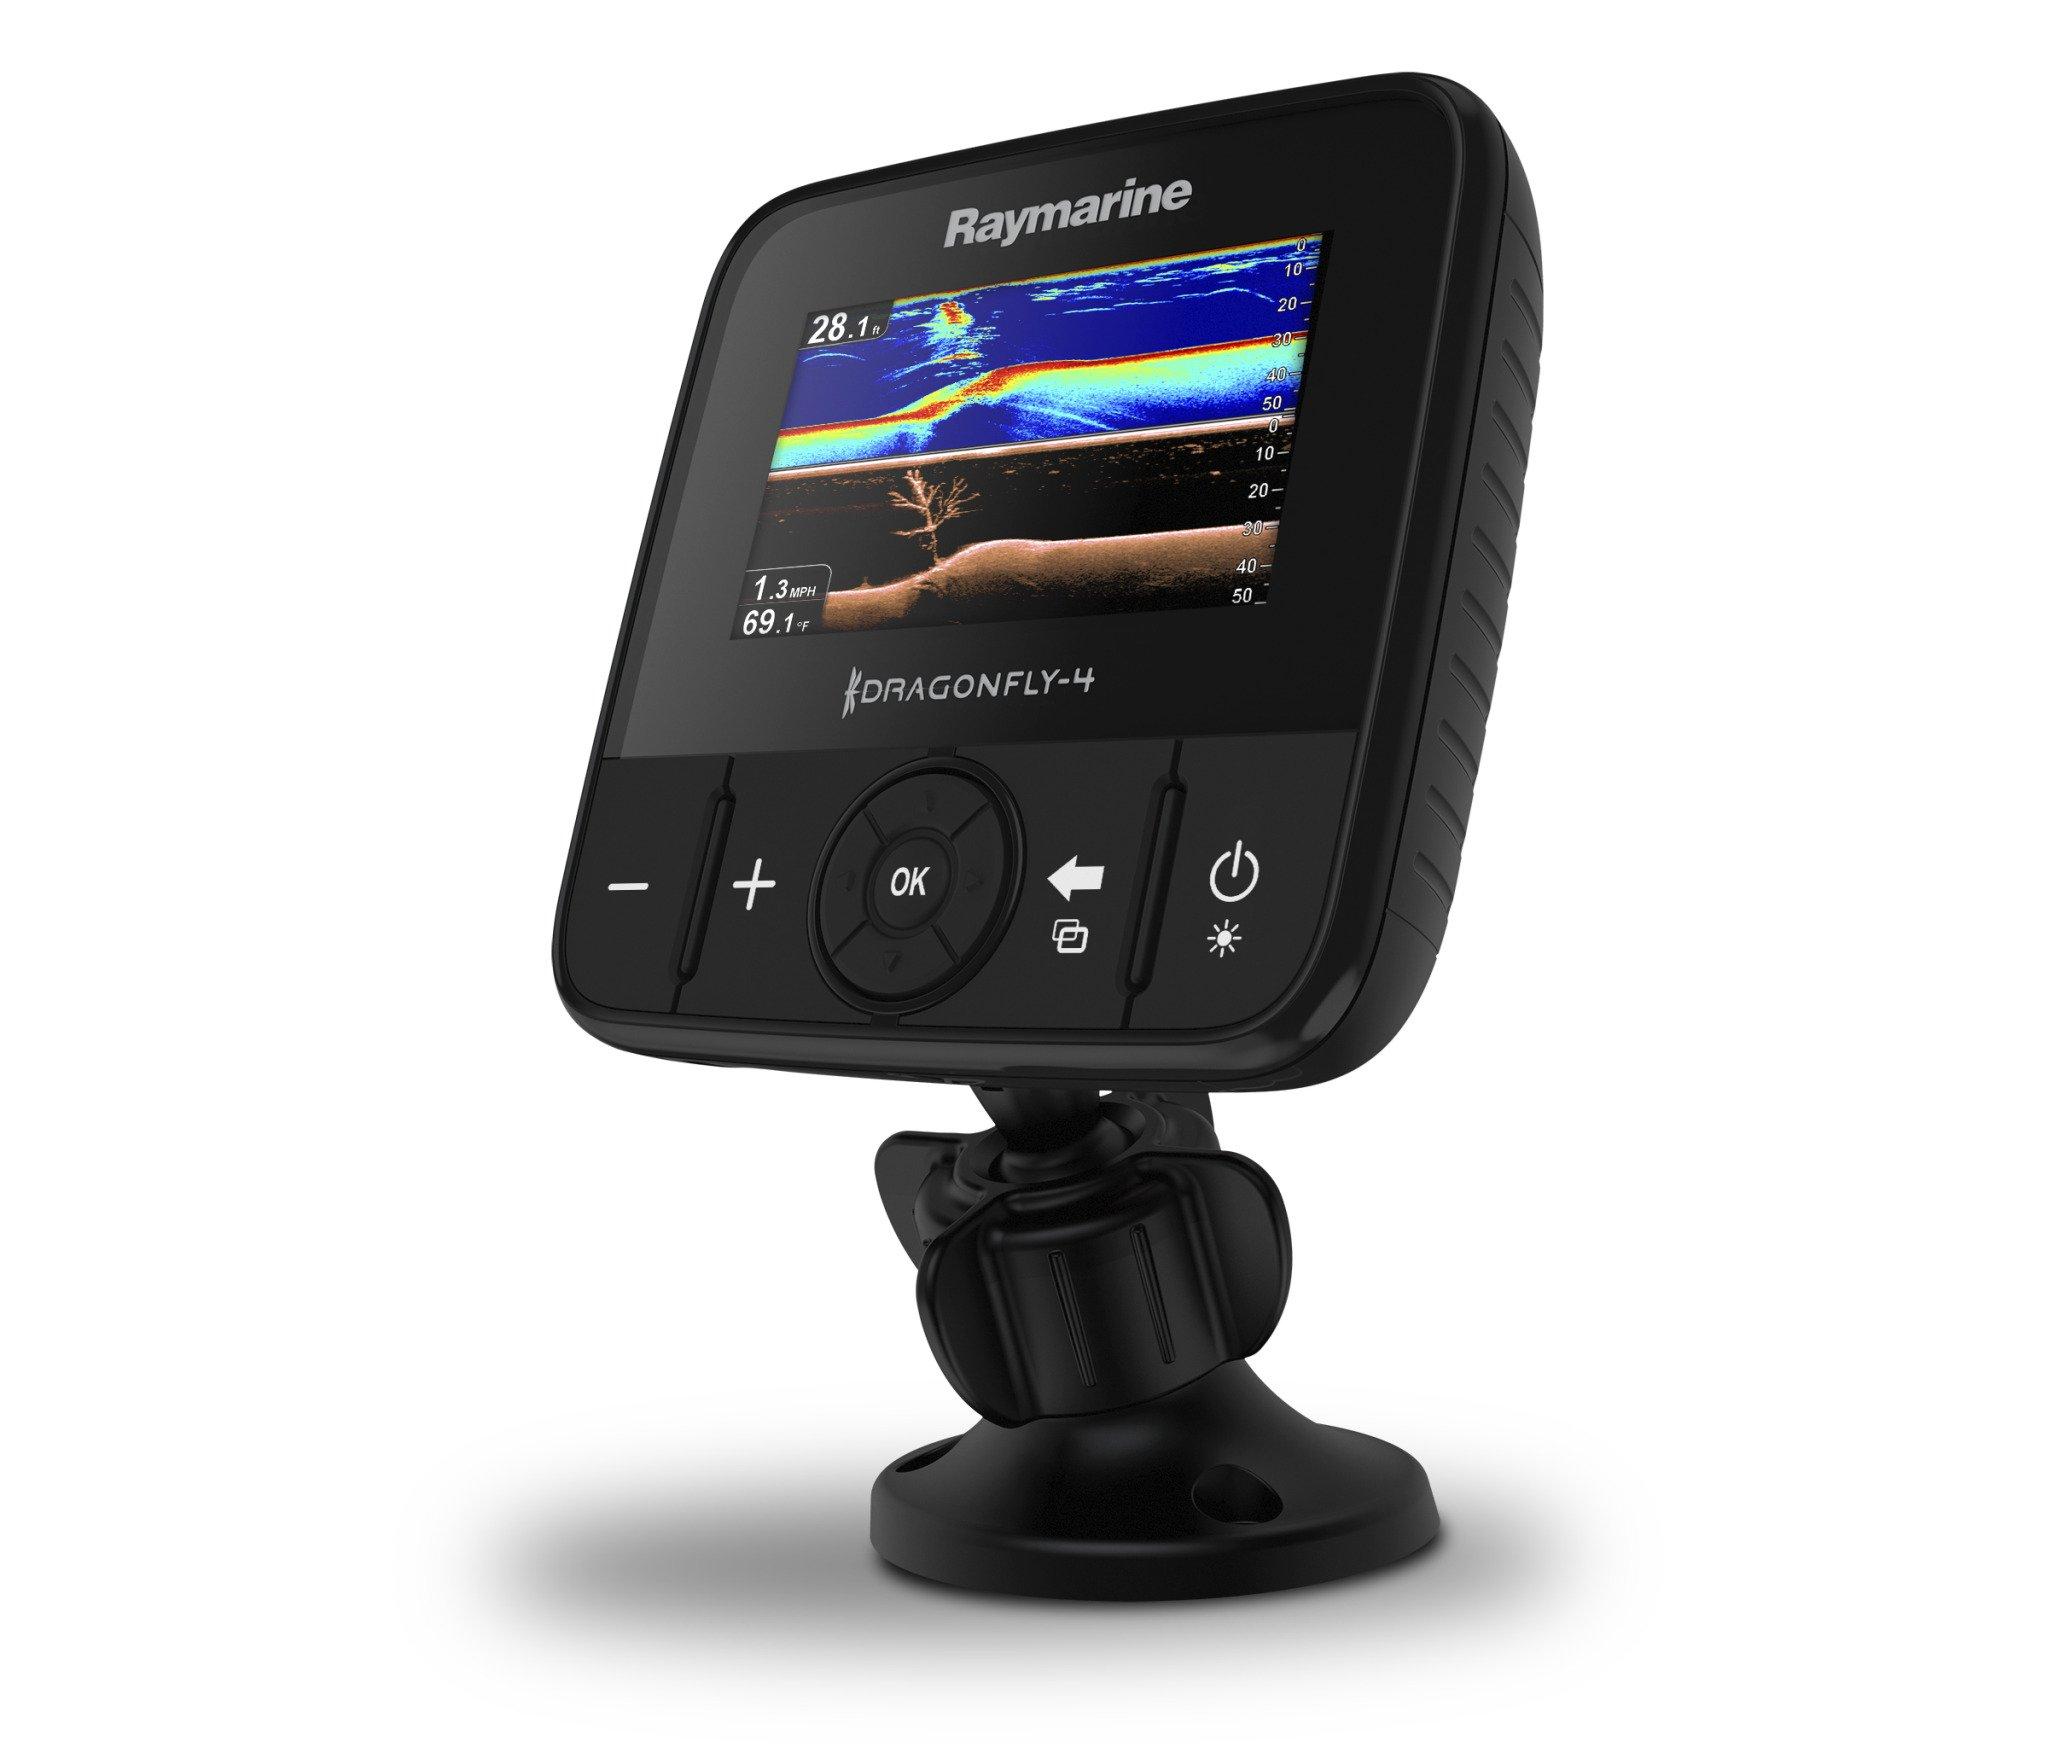 Raymarine Dragonfly-4 Pro Sonar/GPS with US C-Map Essentials by Raymarine